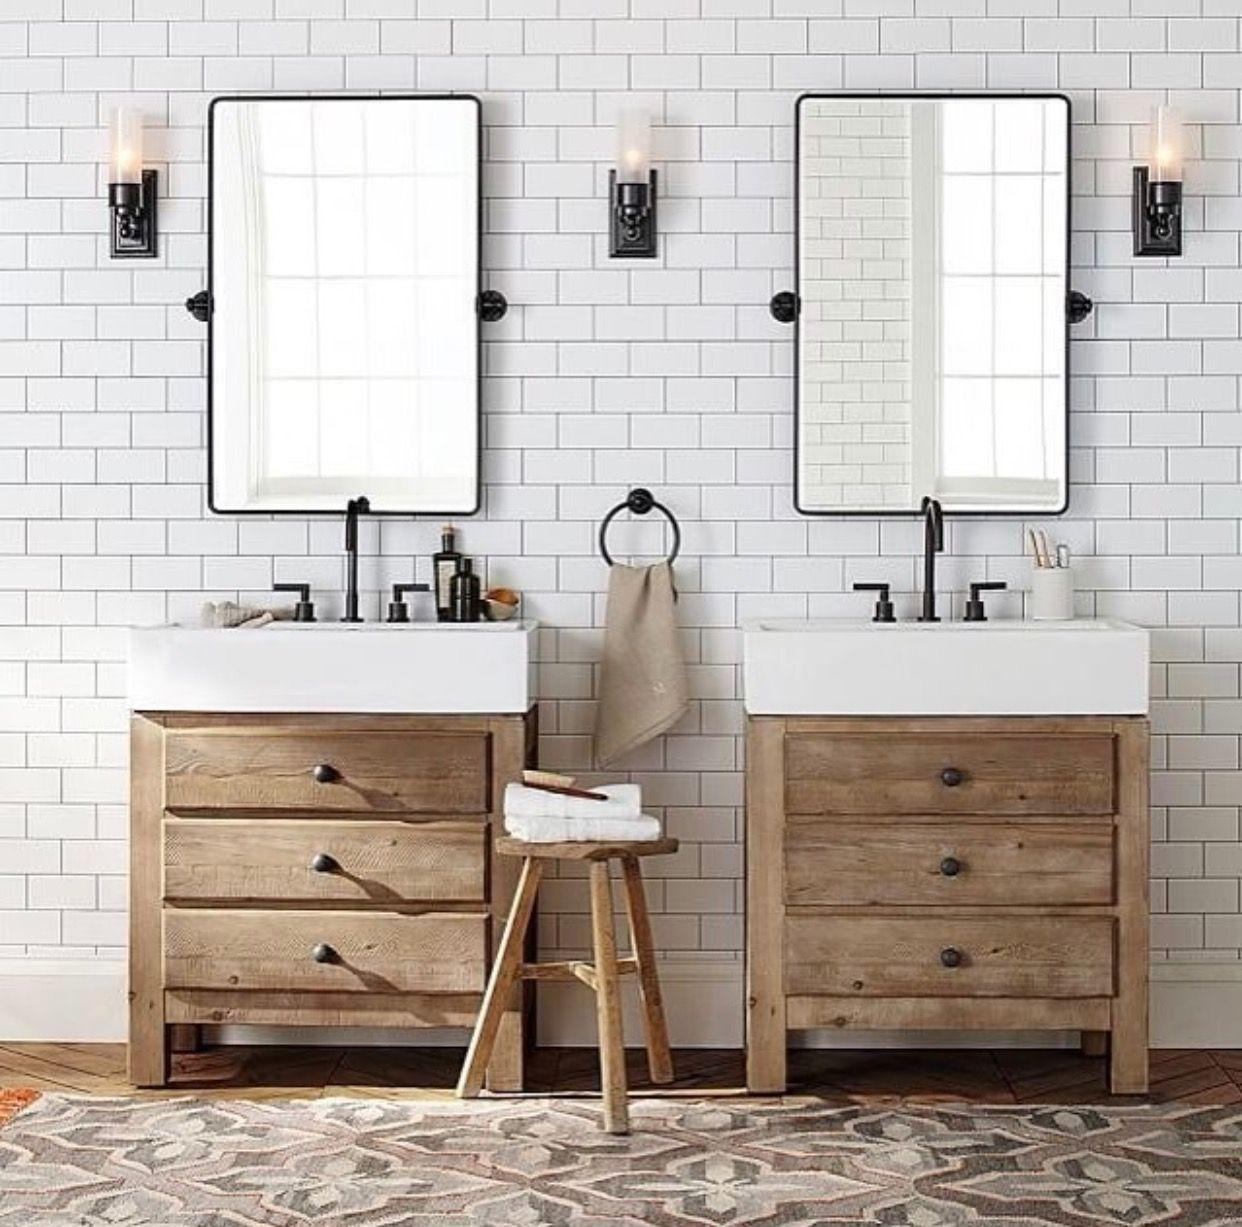 Bad eitelkeit design love the mirrors sinks and vanities lights  bathroom  pinterest